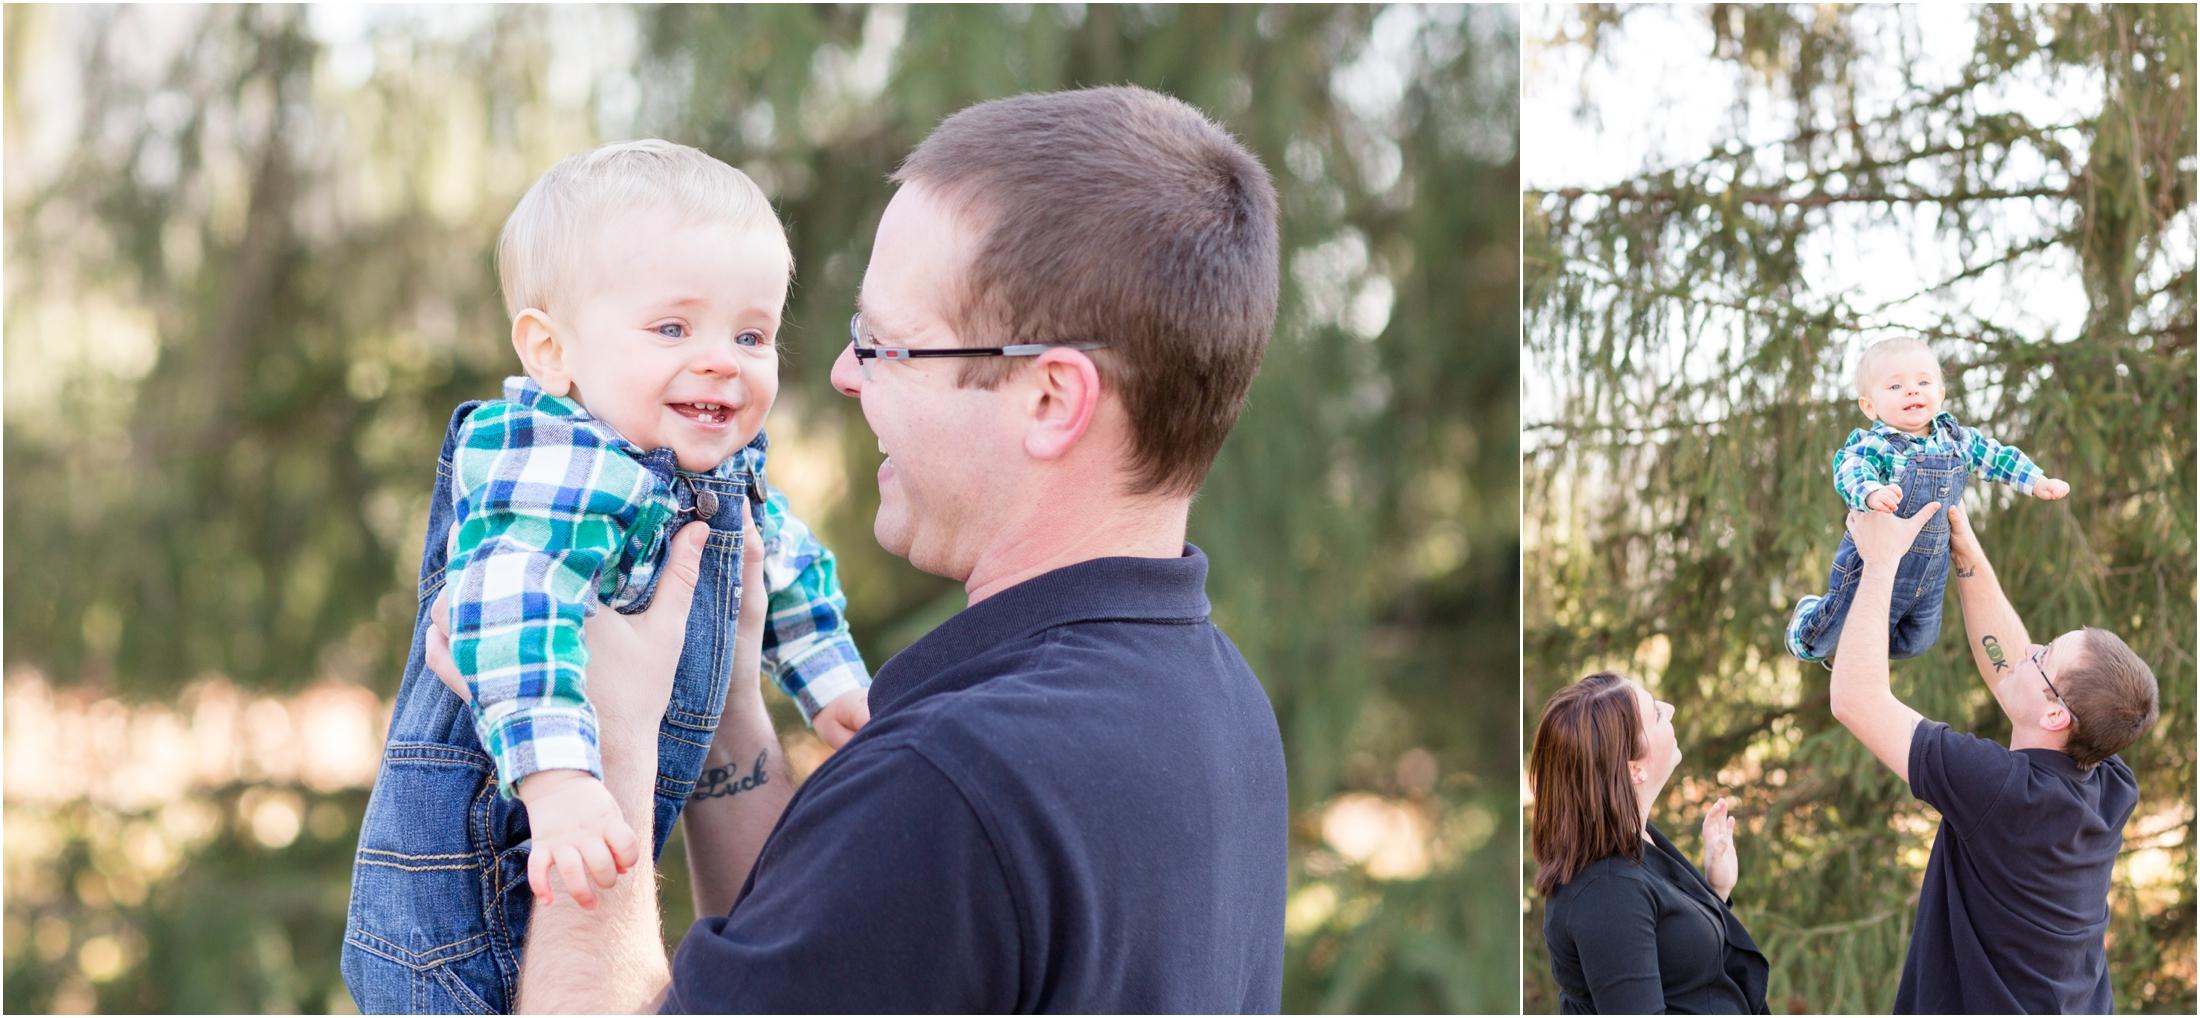 Baby-Bryce-1-Year-2014-194.jpg